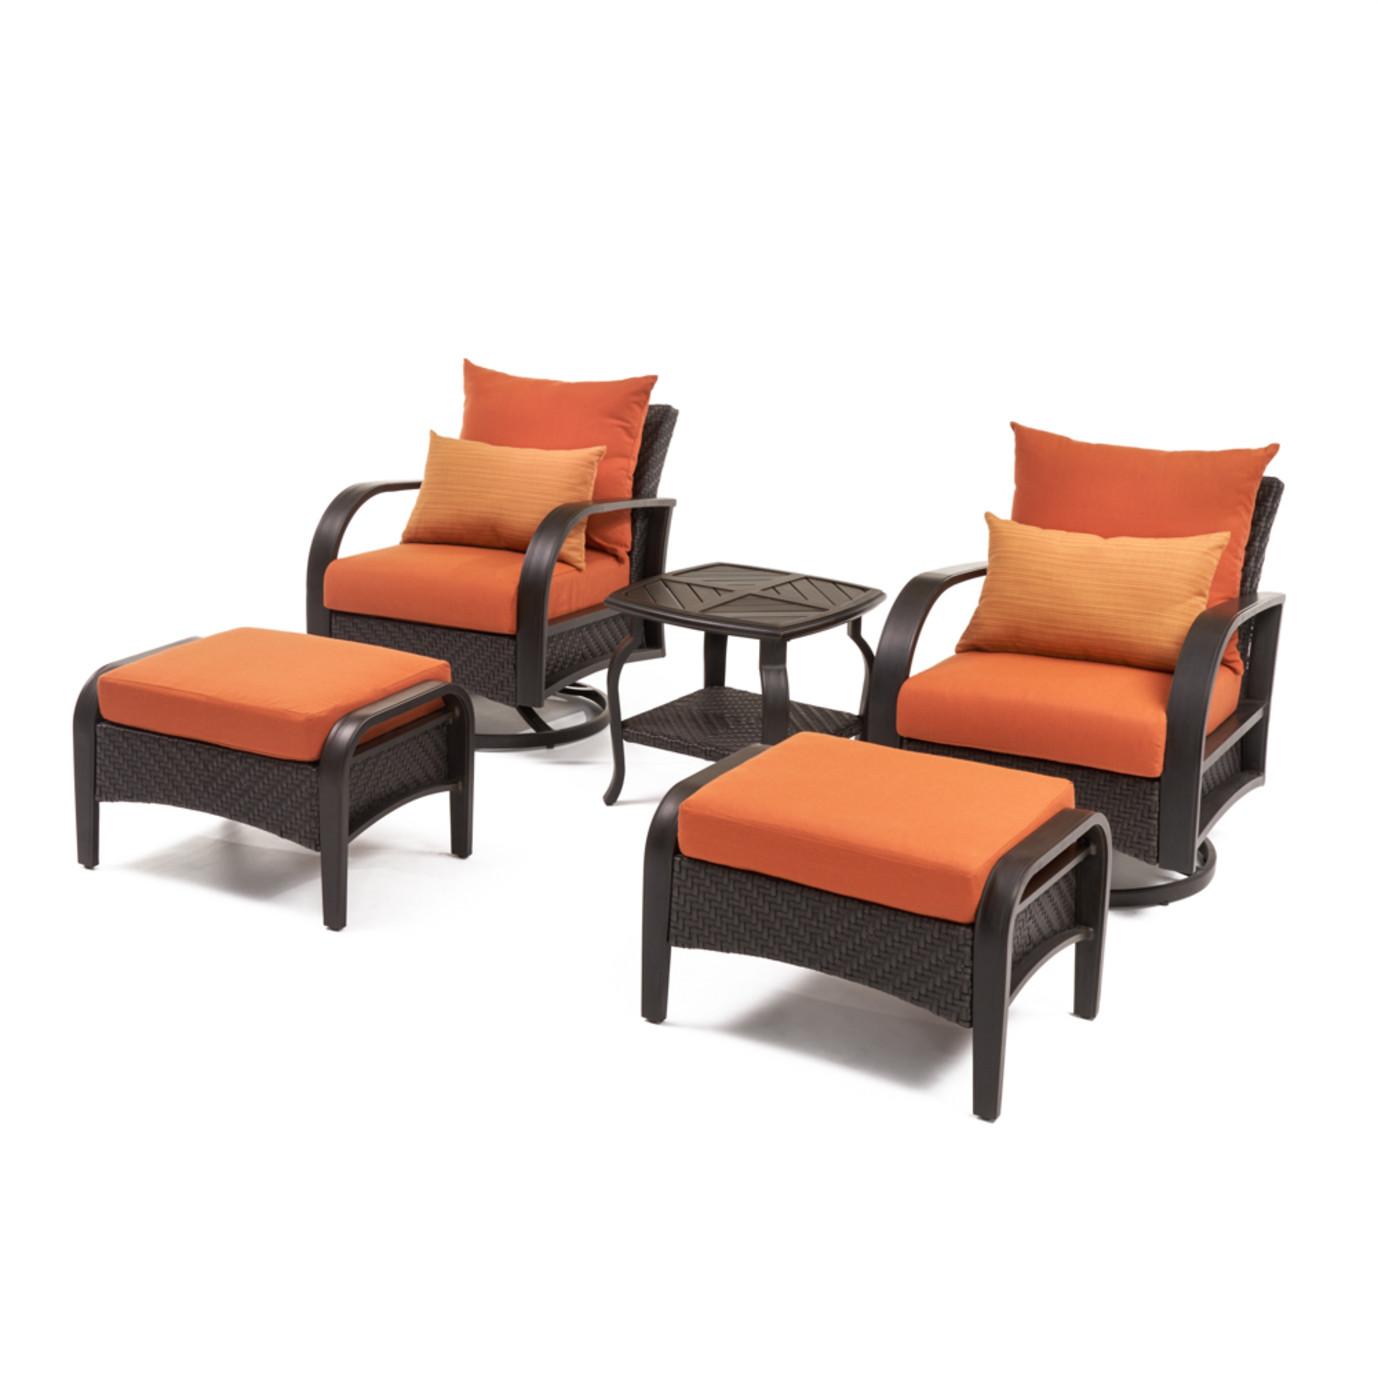 Barcelo™ 5pc Motion Club & Ottoman Set - Tikka Orange